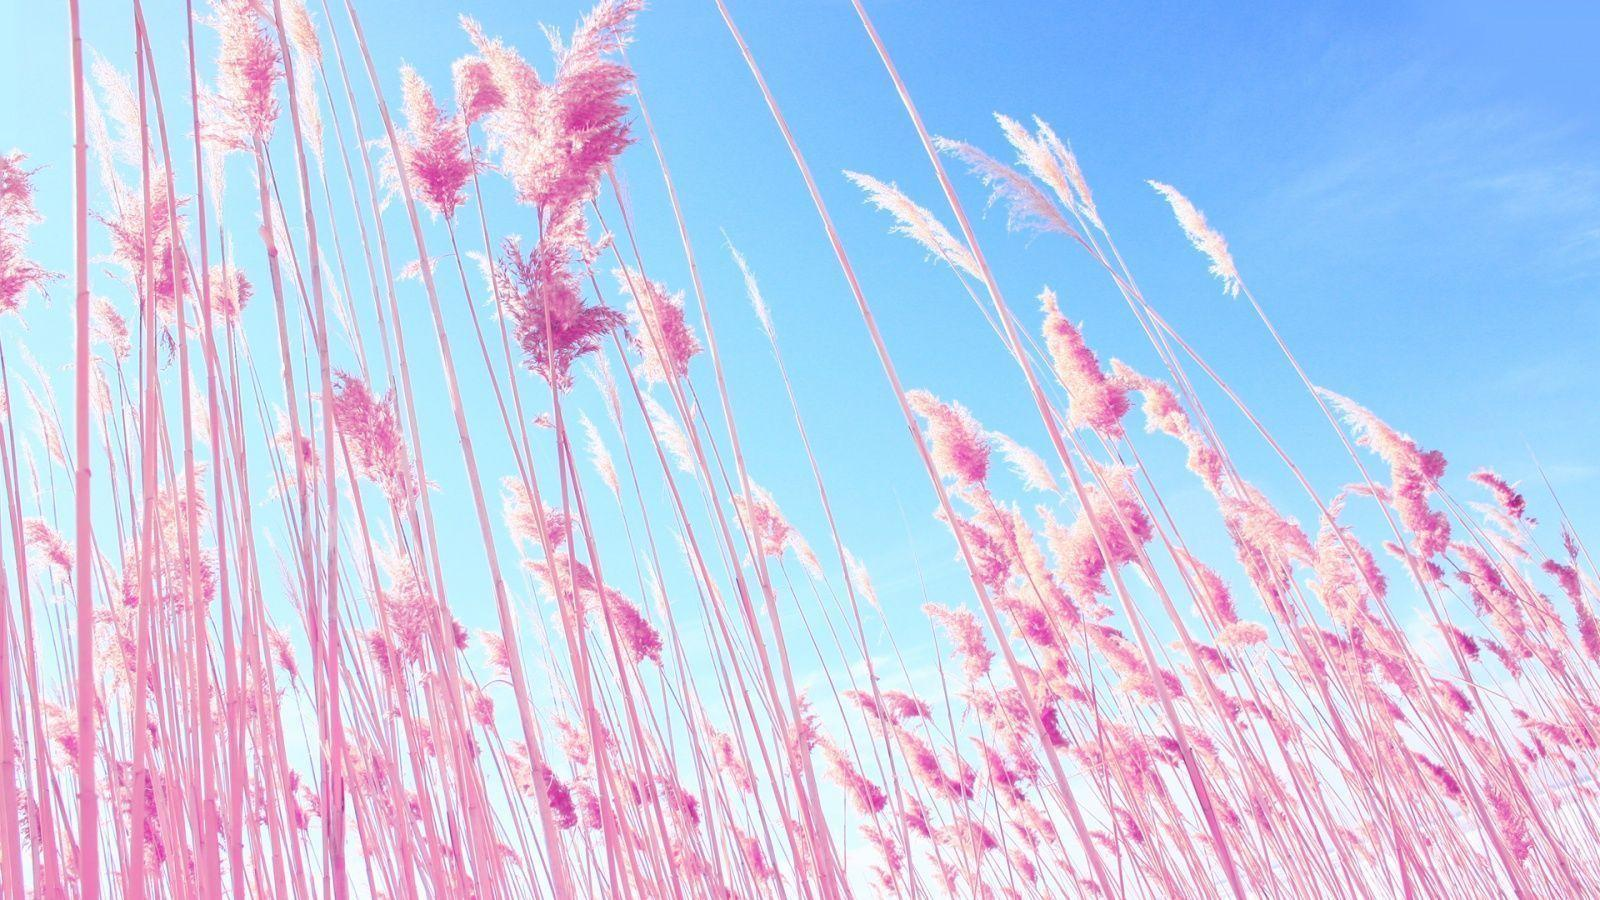 Pink Desktop Backgrounds 1600x900